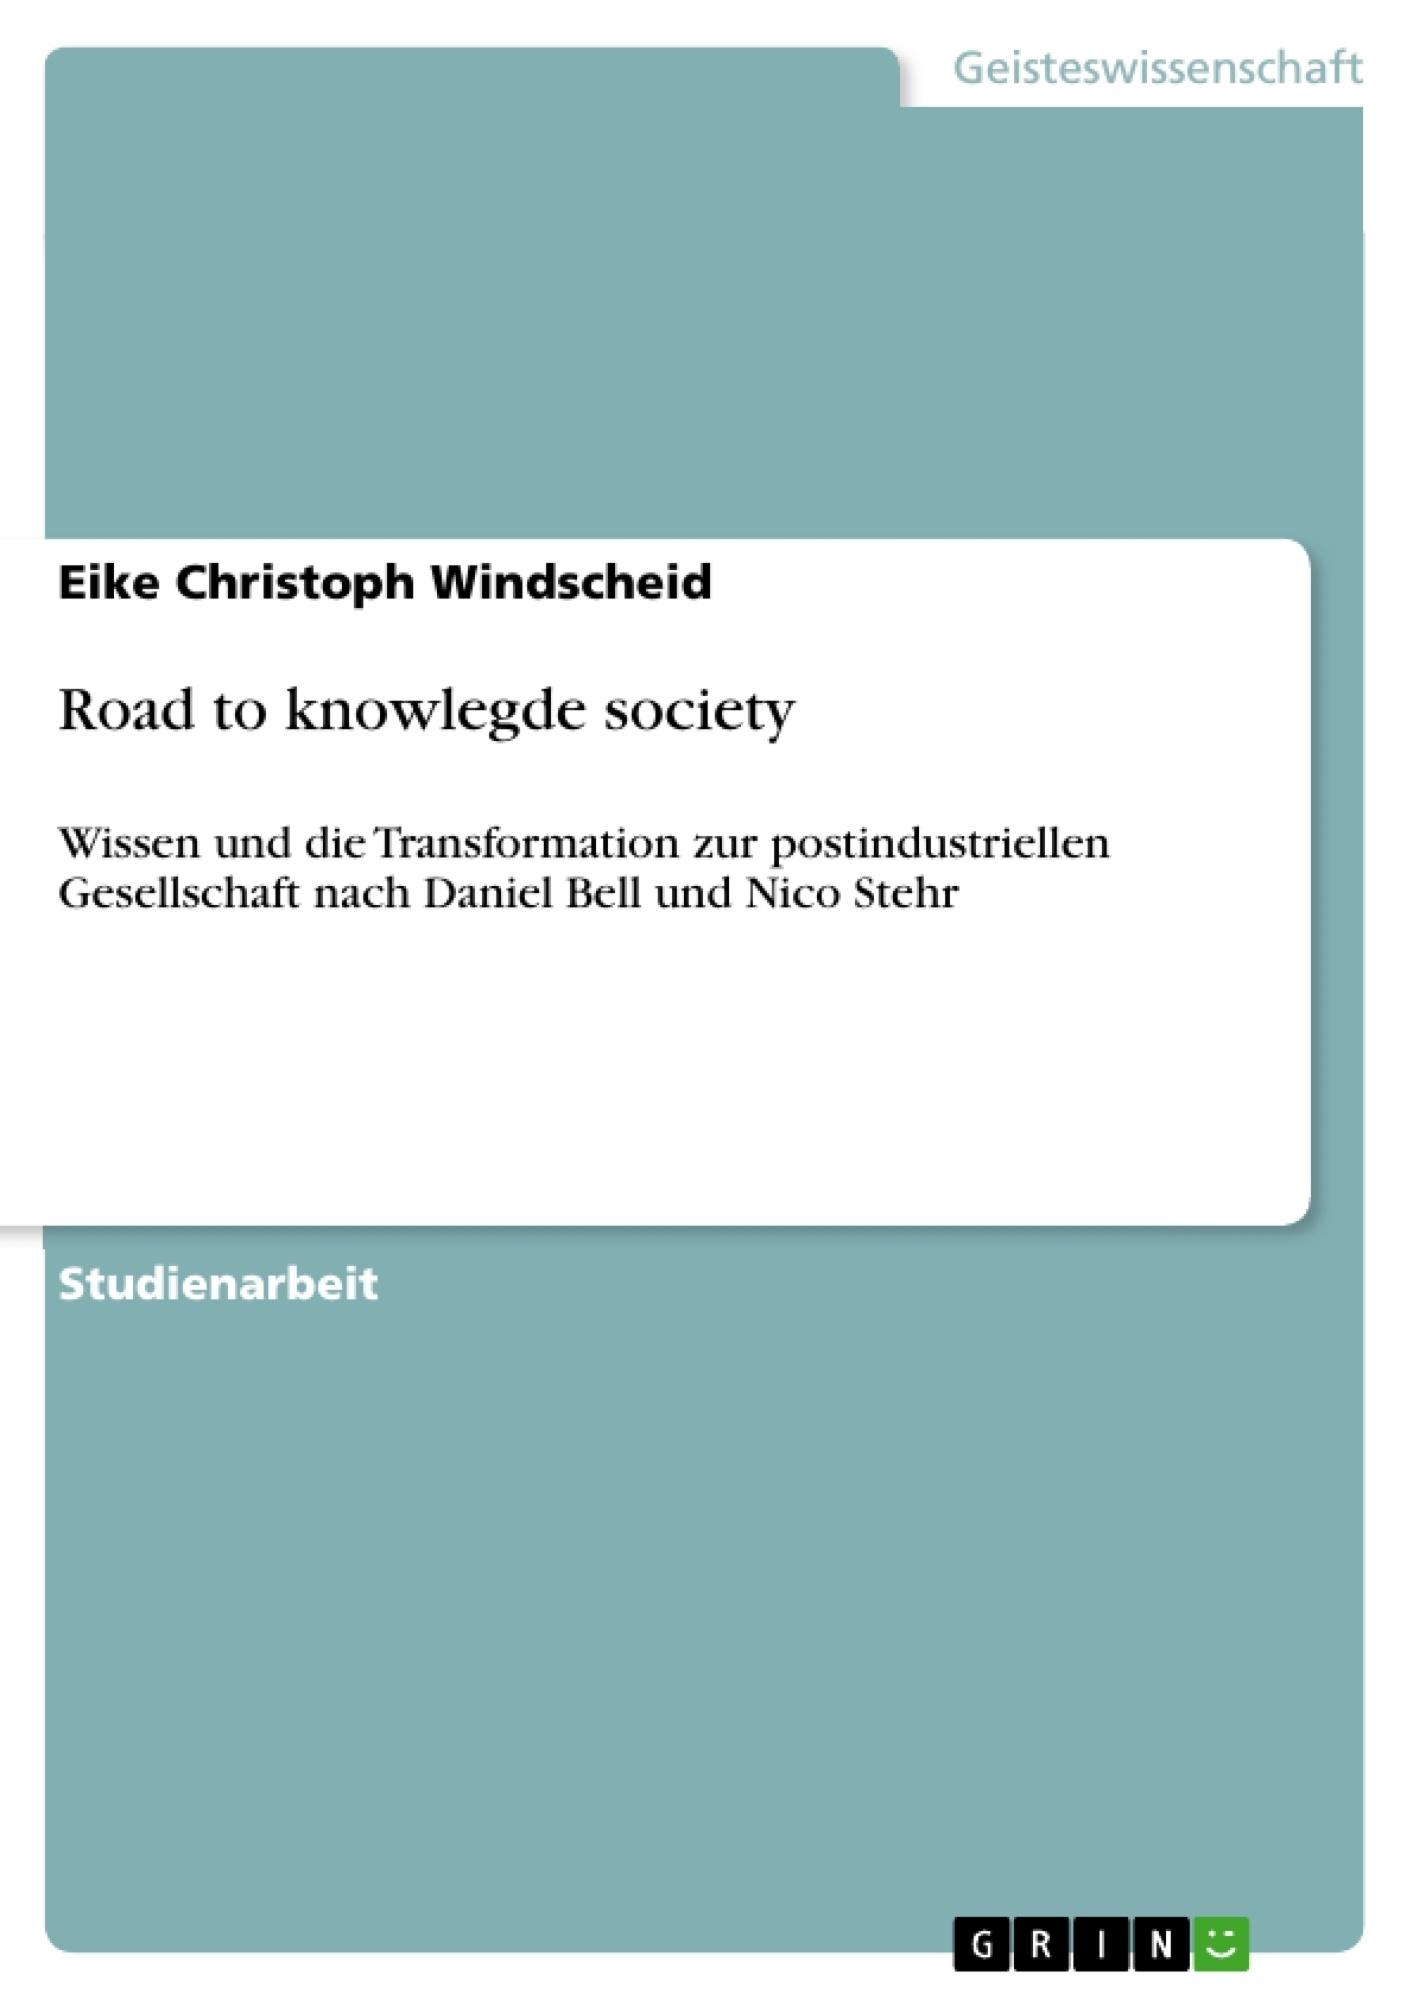 Titel: Road to knowlegde society